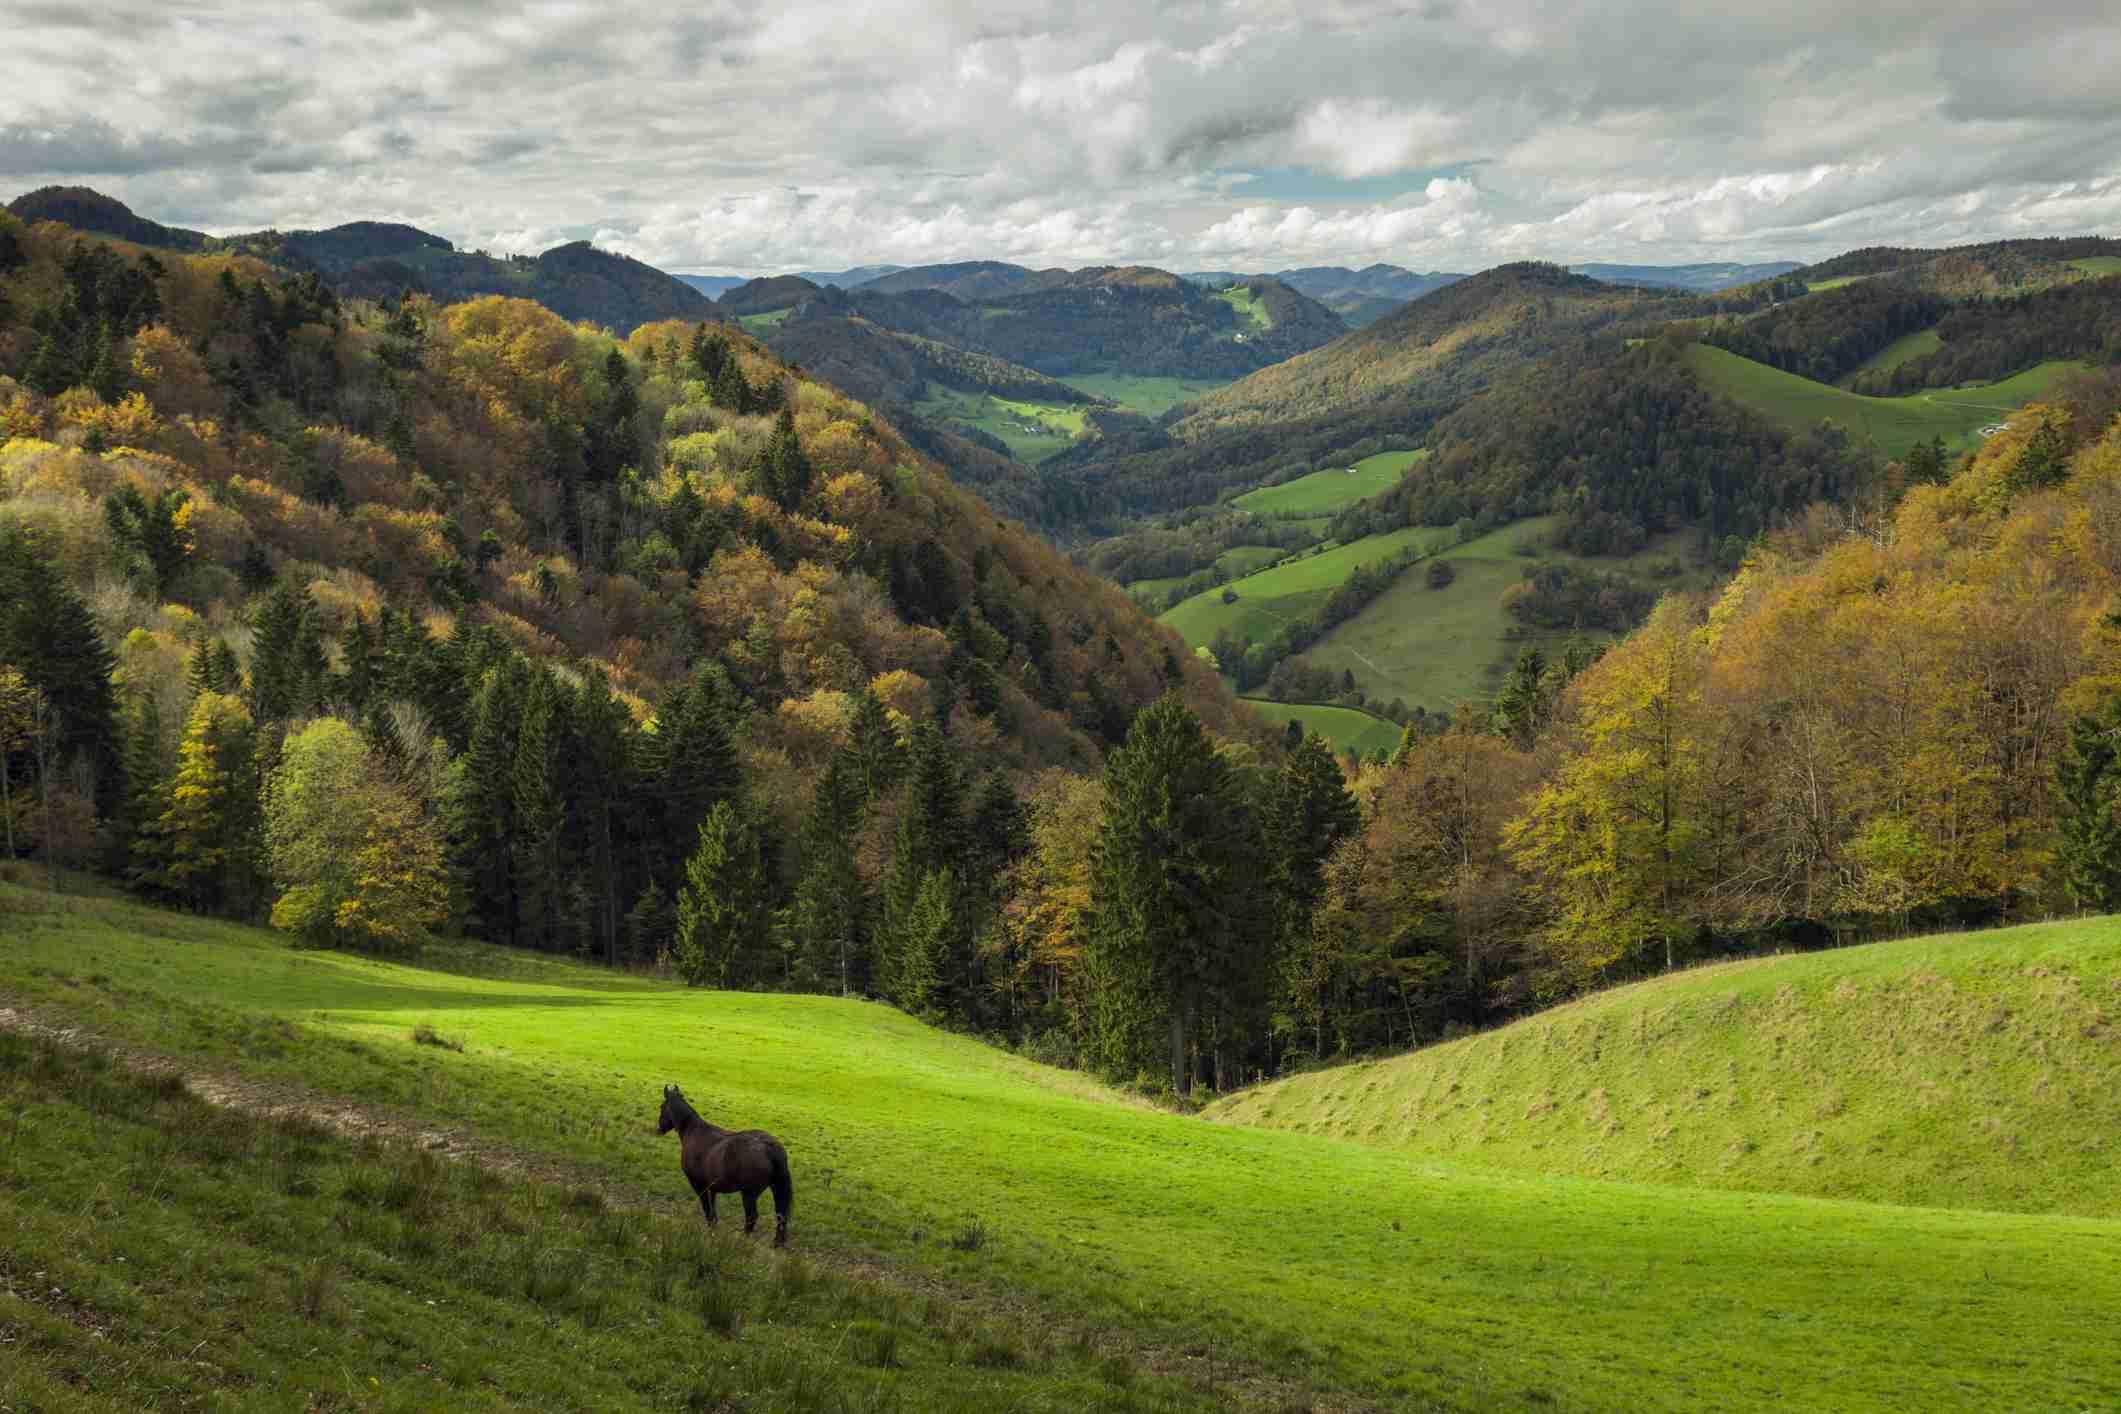 A horse stands among lush green hills